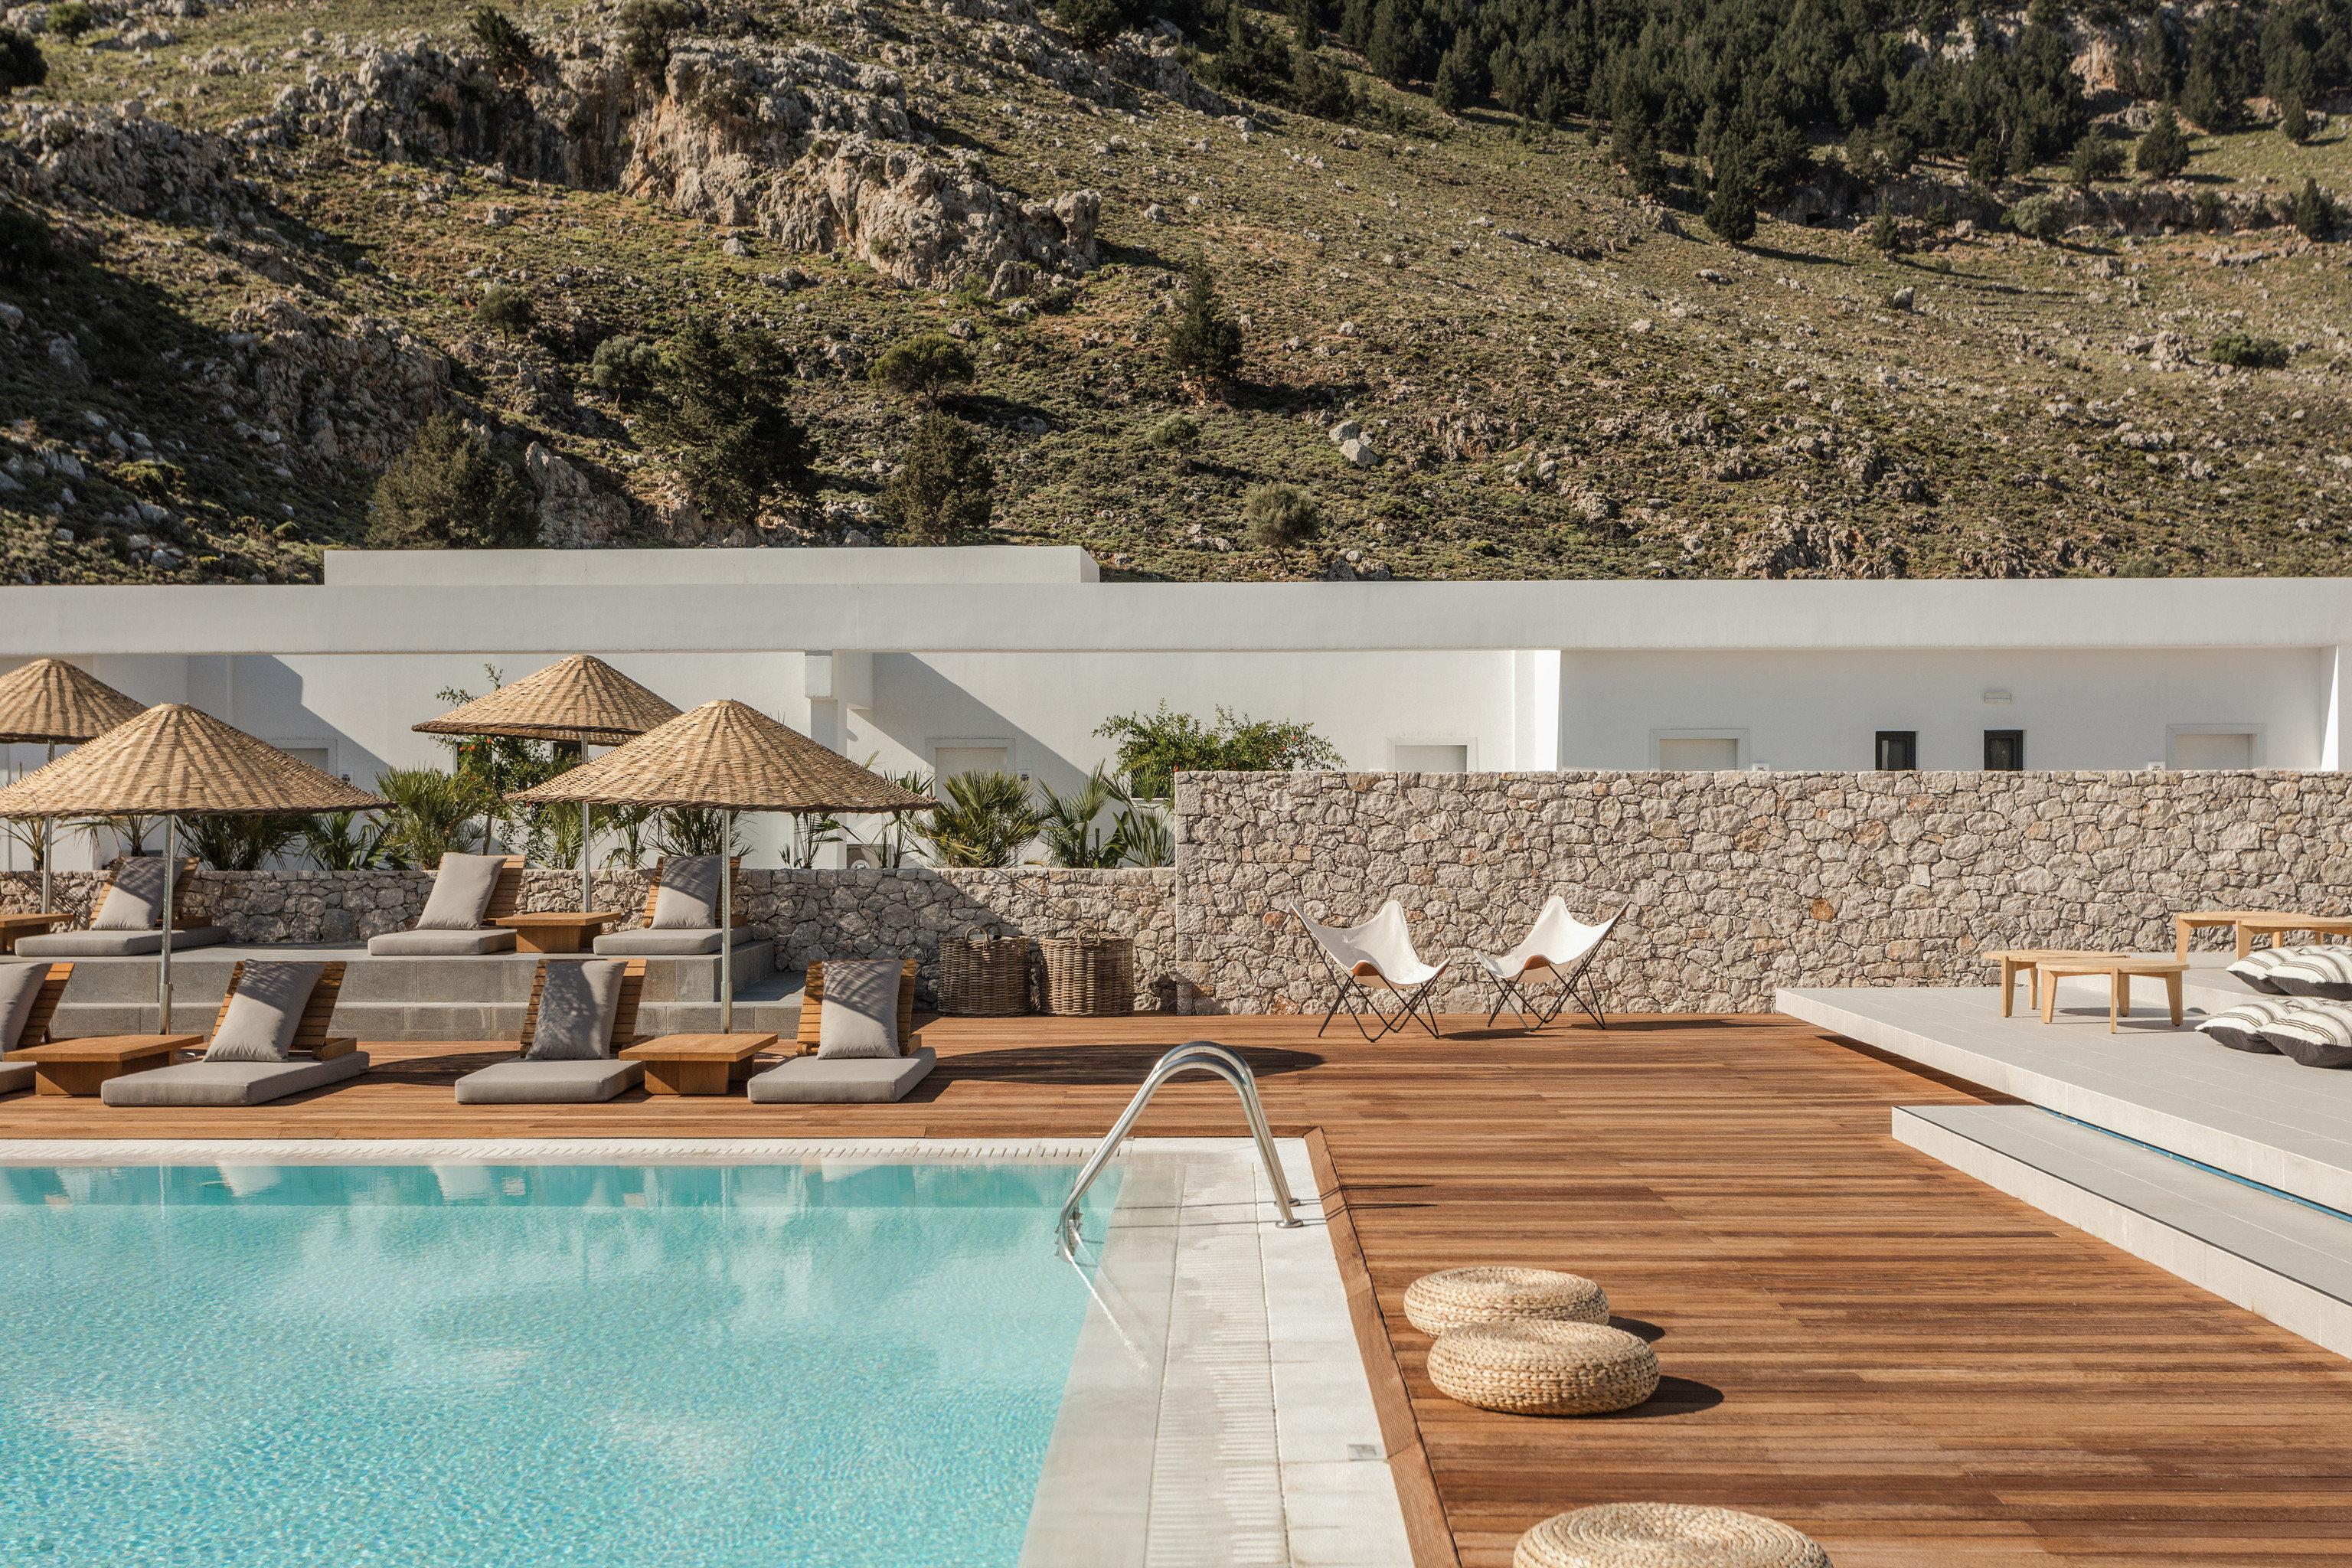 Hotels ground outdoor property swimming pool estate backyard Villa